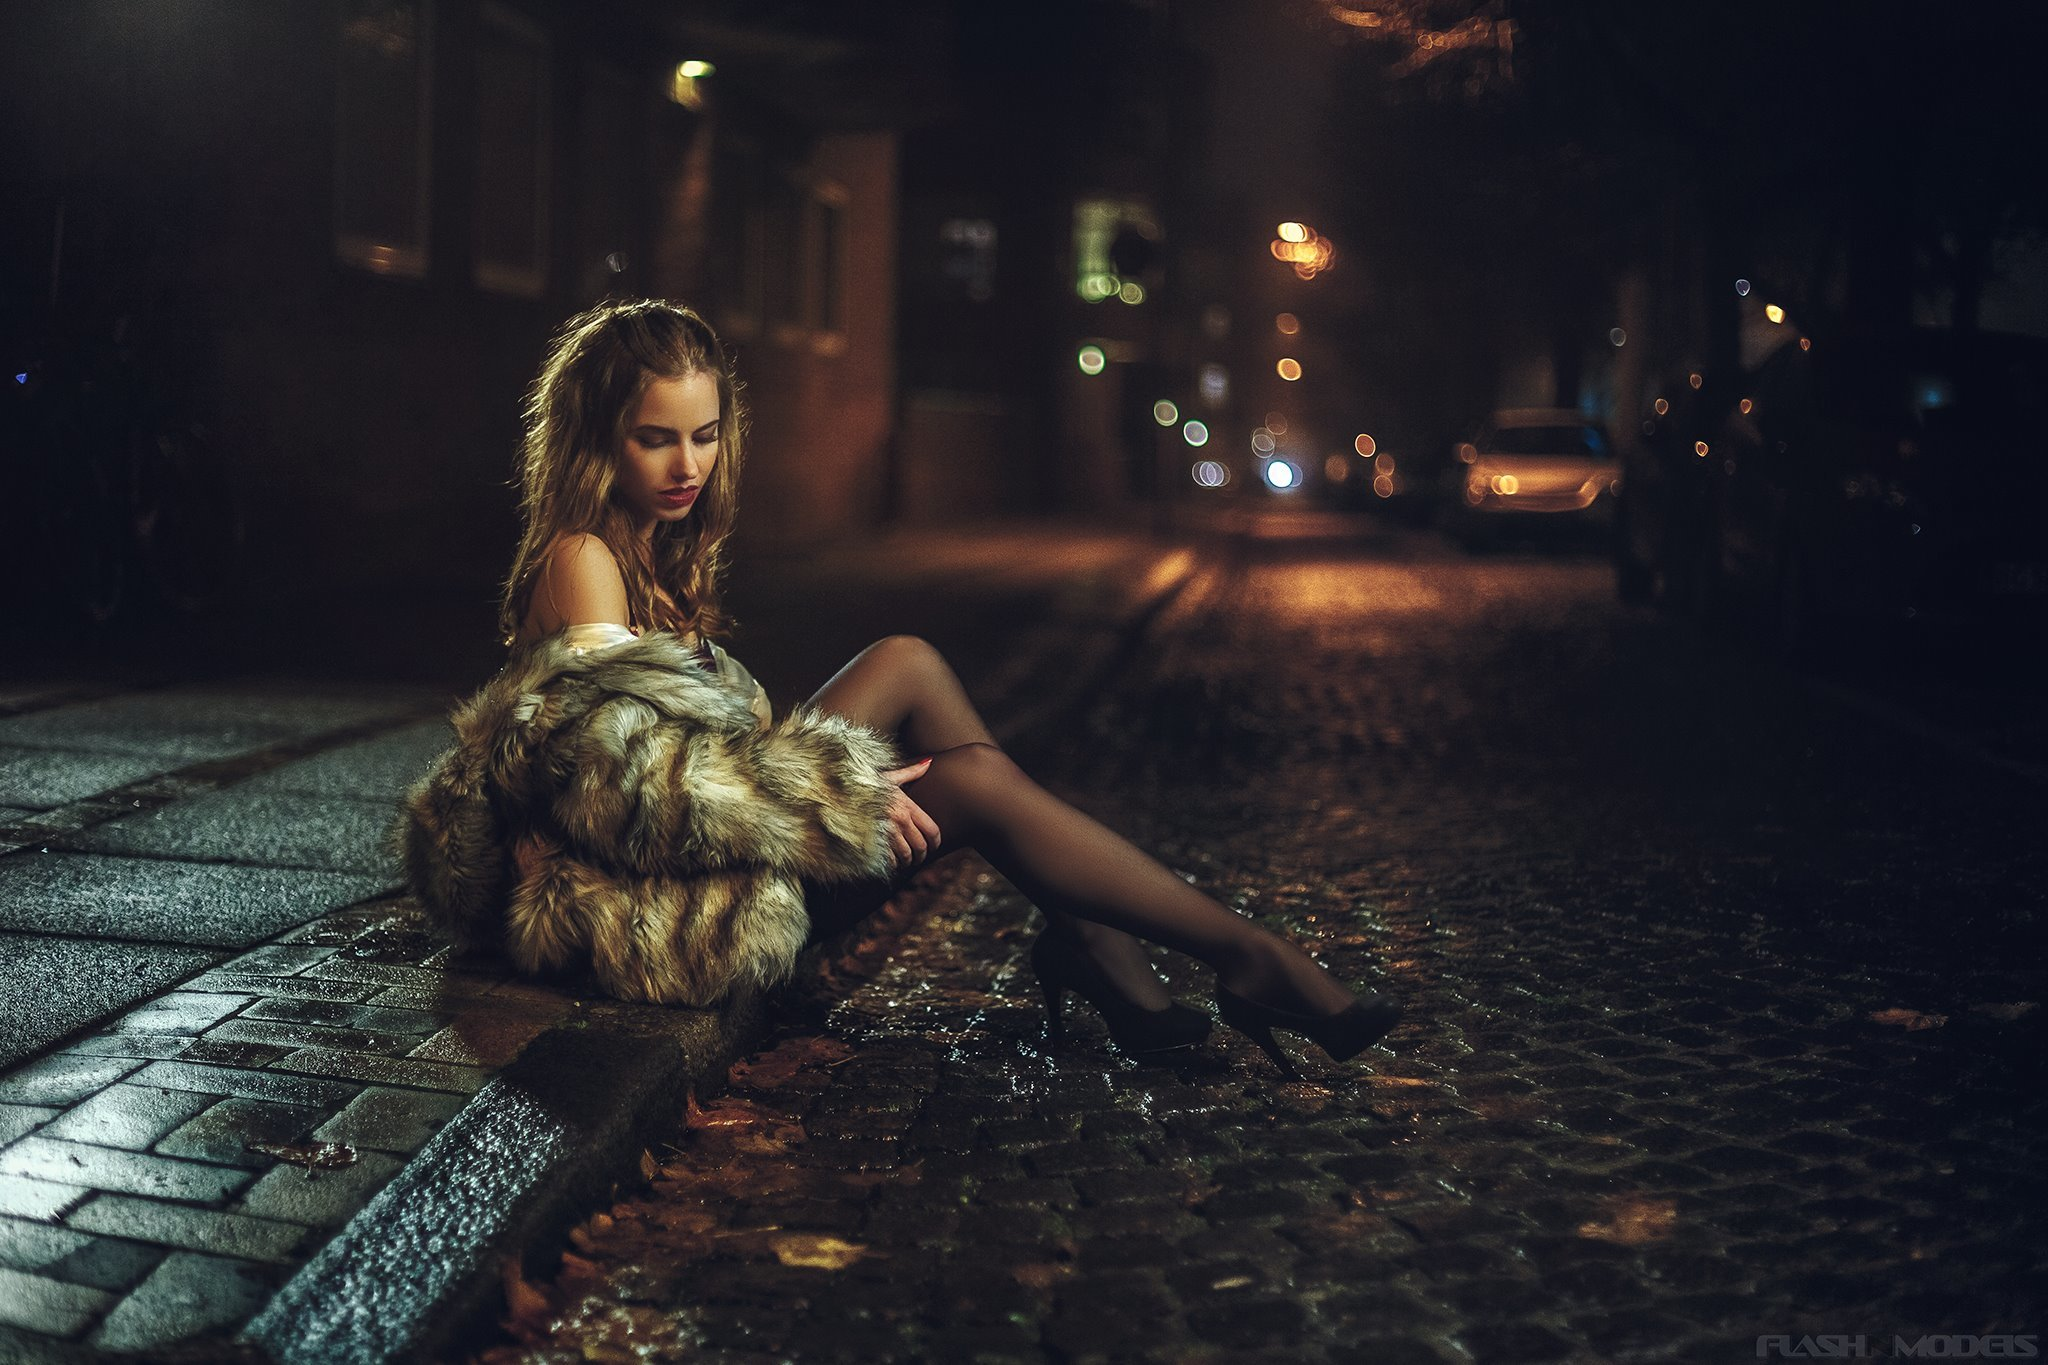 Night sexy girl #12